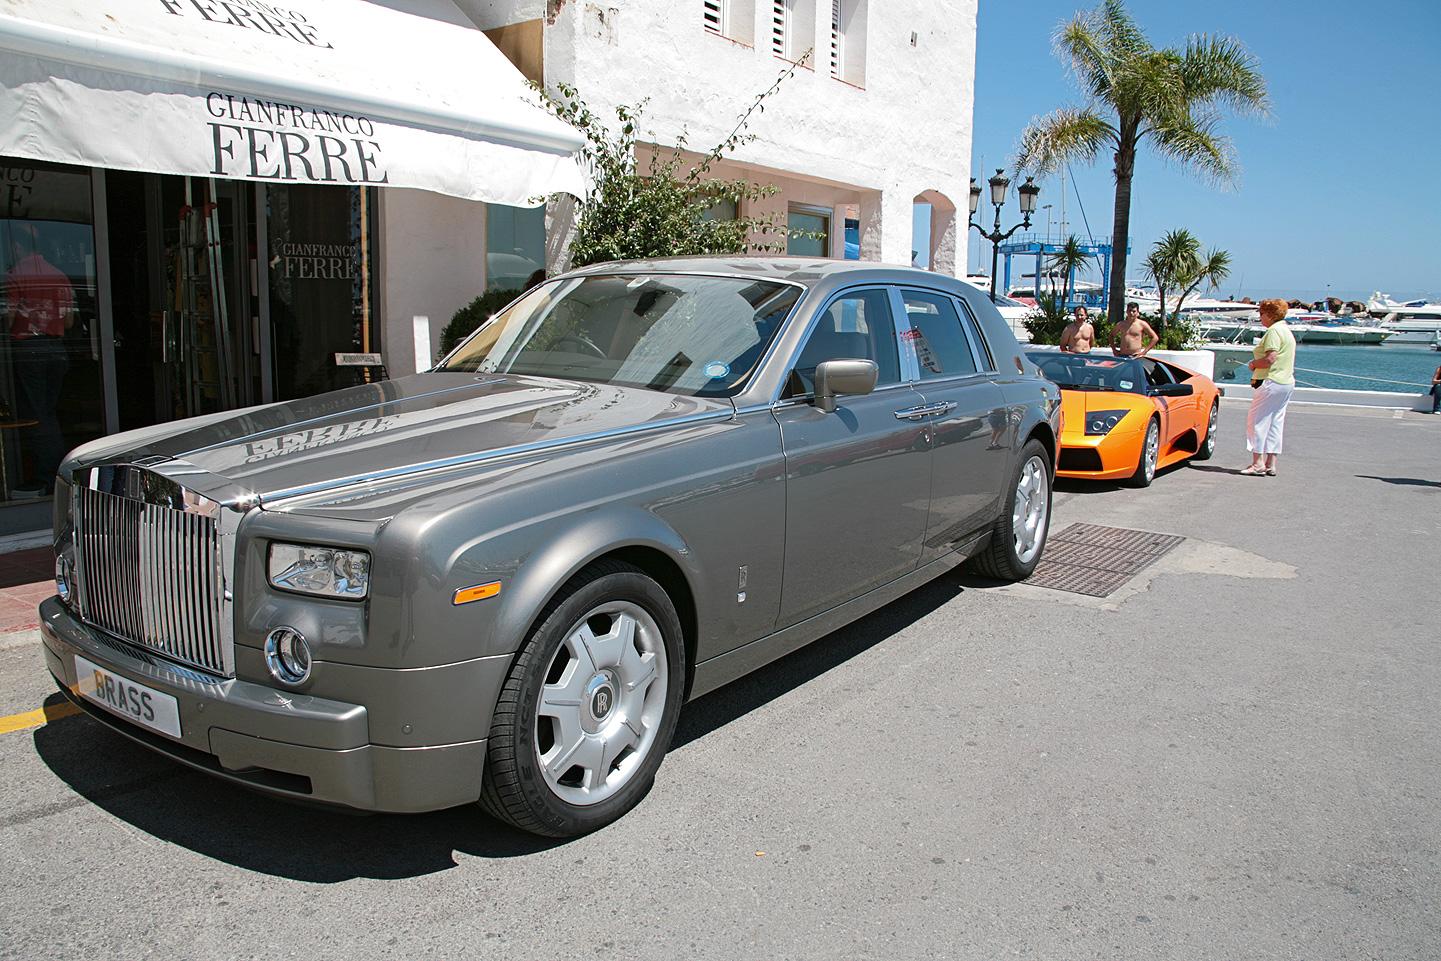 Rolls Royce Phantom and Lamborghini Murcielago by the Marina